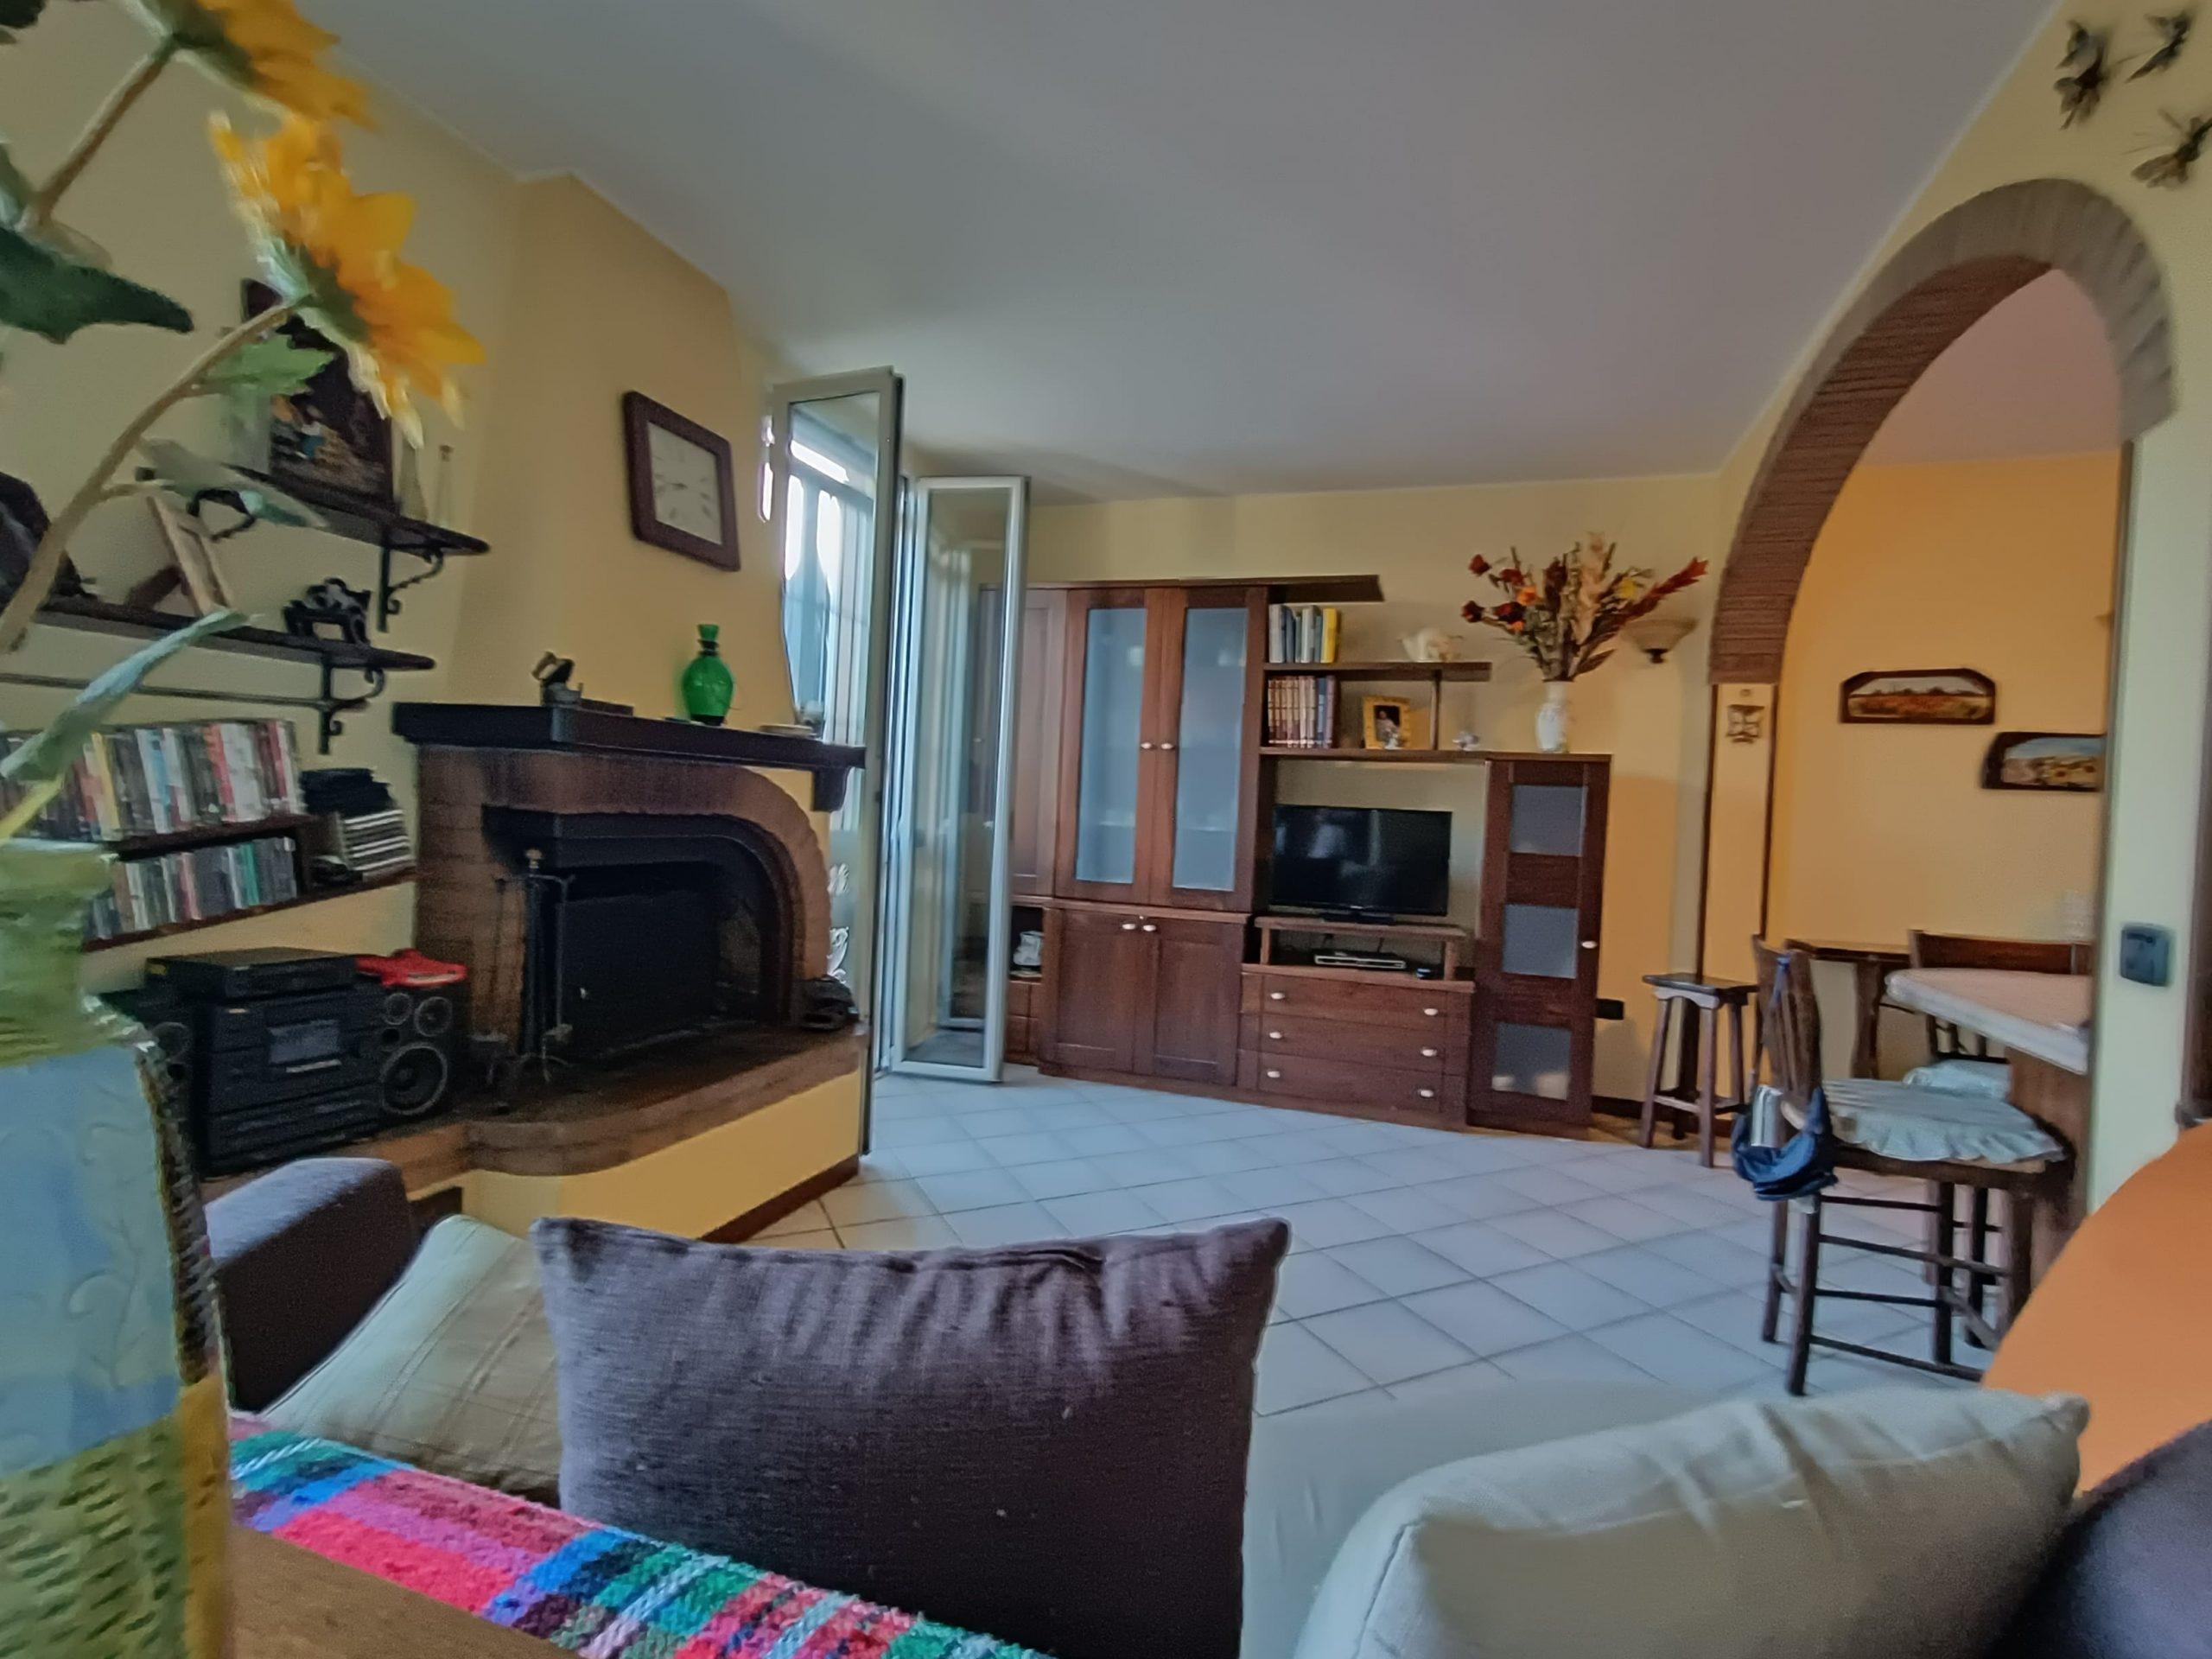 Luminoso con giardino piano terra €140.000 Castel Bolognese